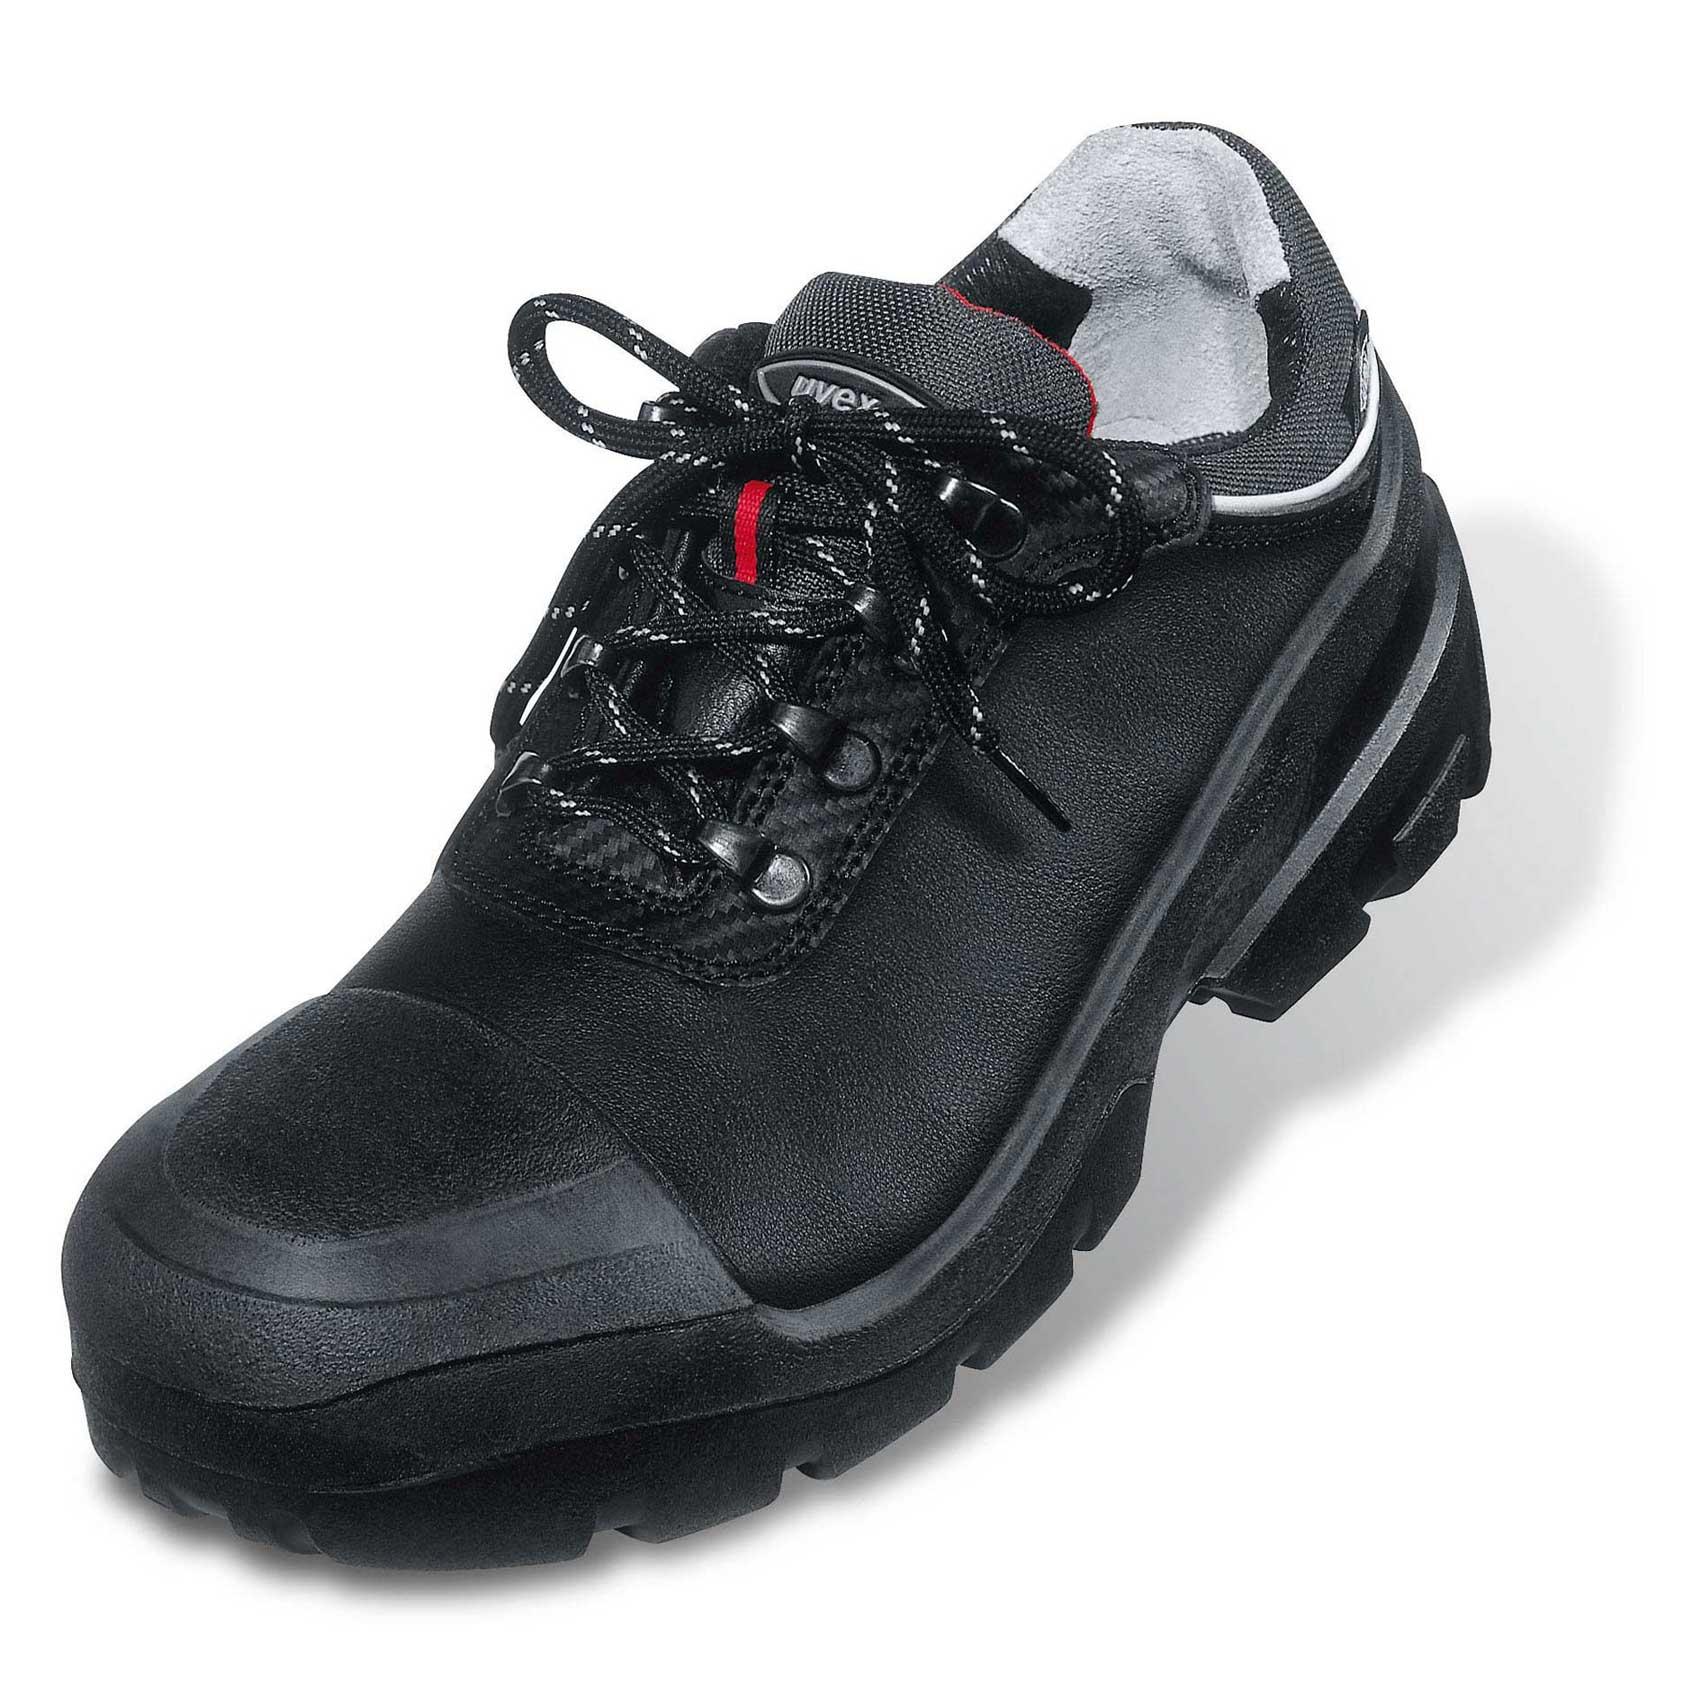 a8b084fed03 uvex quatro pro S3 SRC shoe   Safety shoes   uvex safety